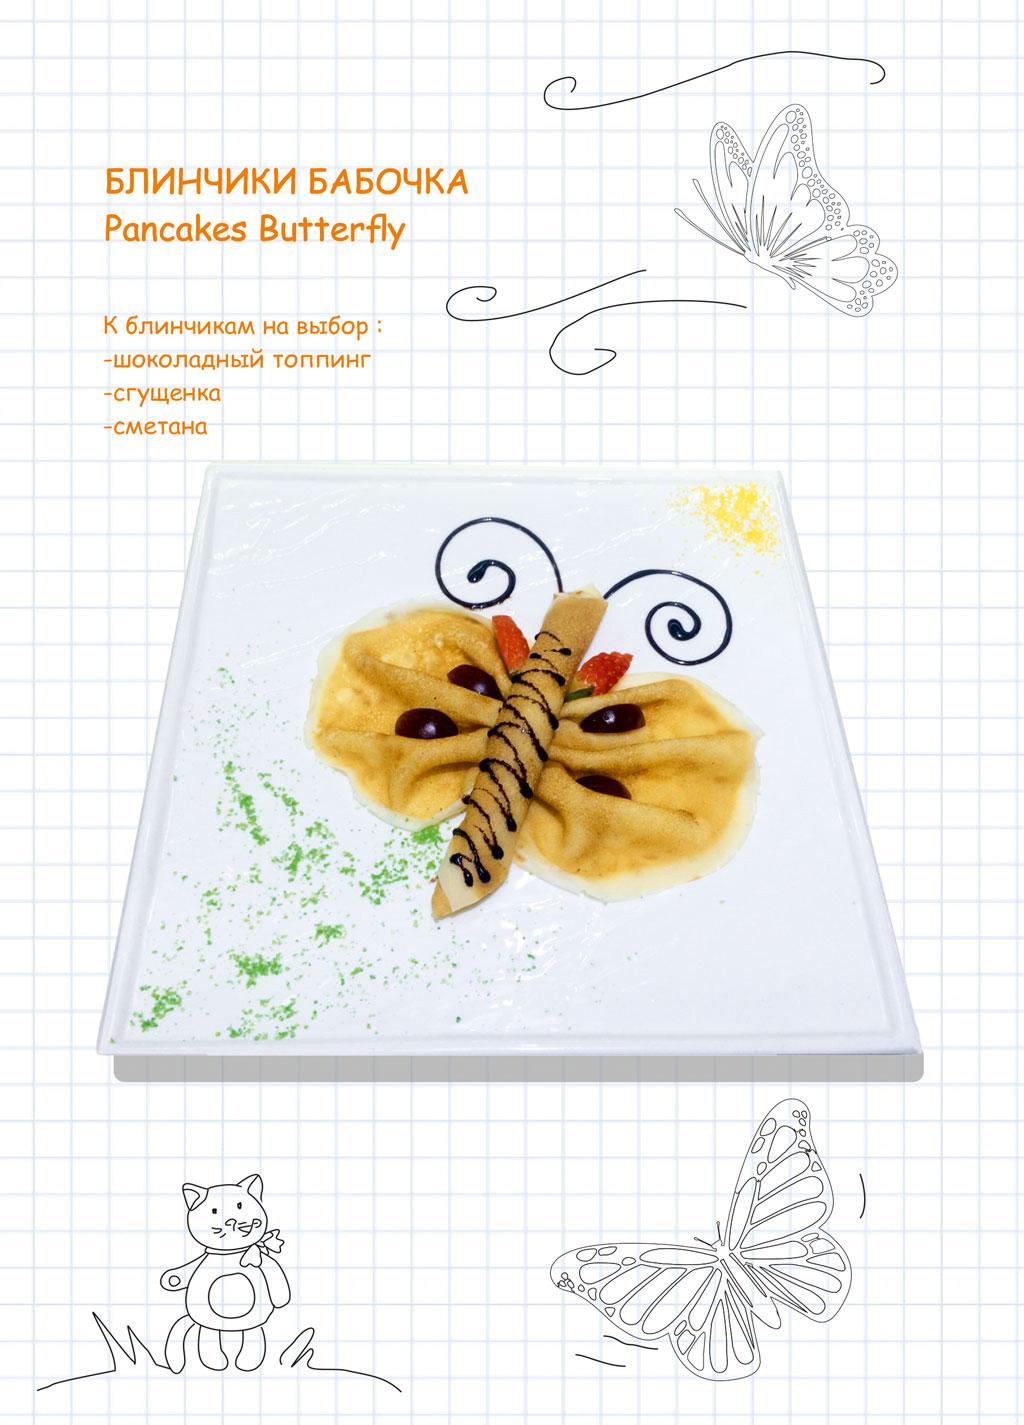 Блинчики Бабочка (Pancakes Butterfly) в ресторане Аннам Брахма в Оренбурге